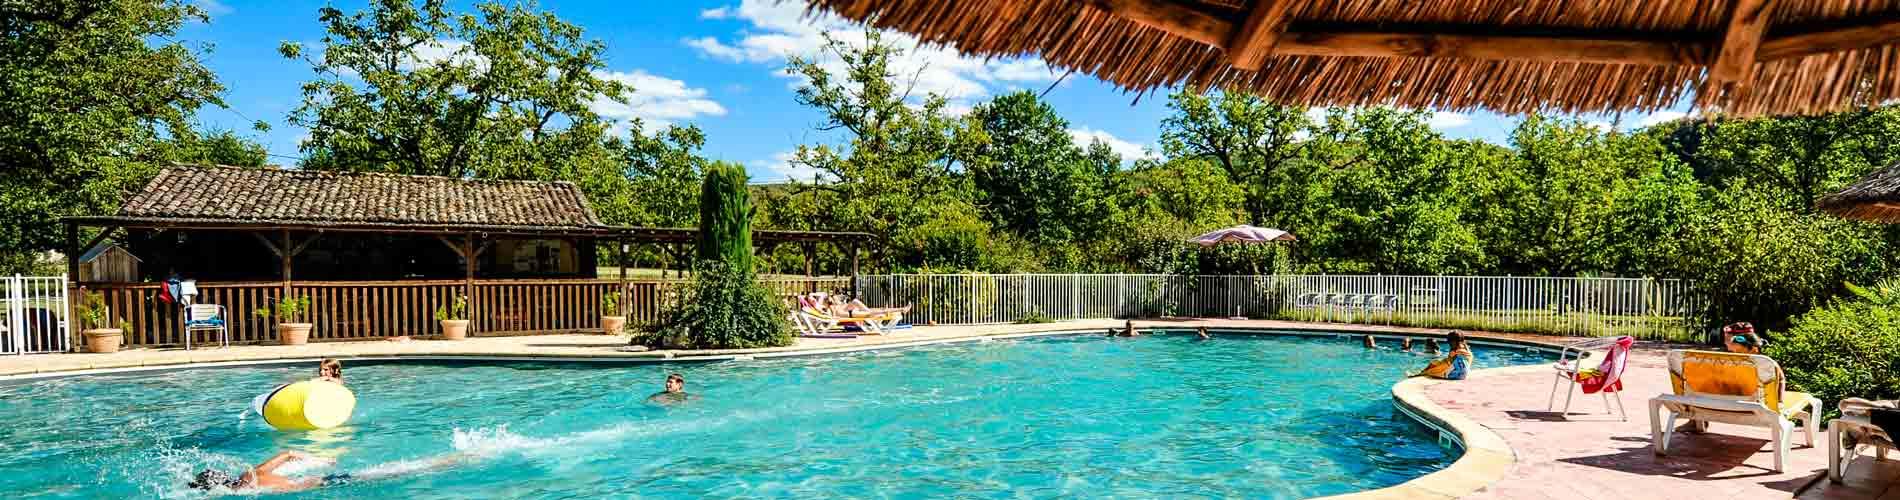 Camping lot avec piscine camping avec espace quatique for Camping embrun avec piscine